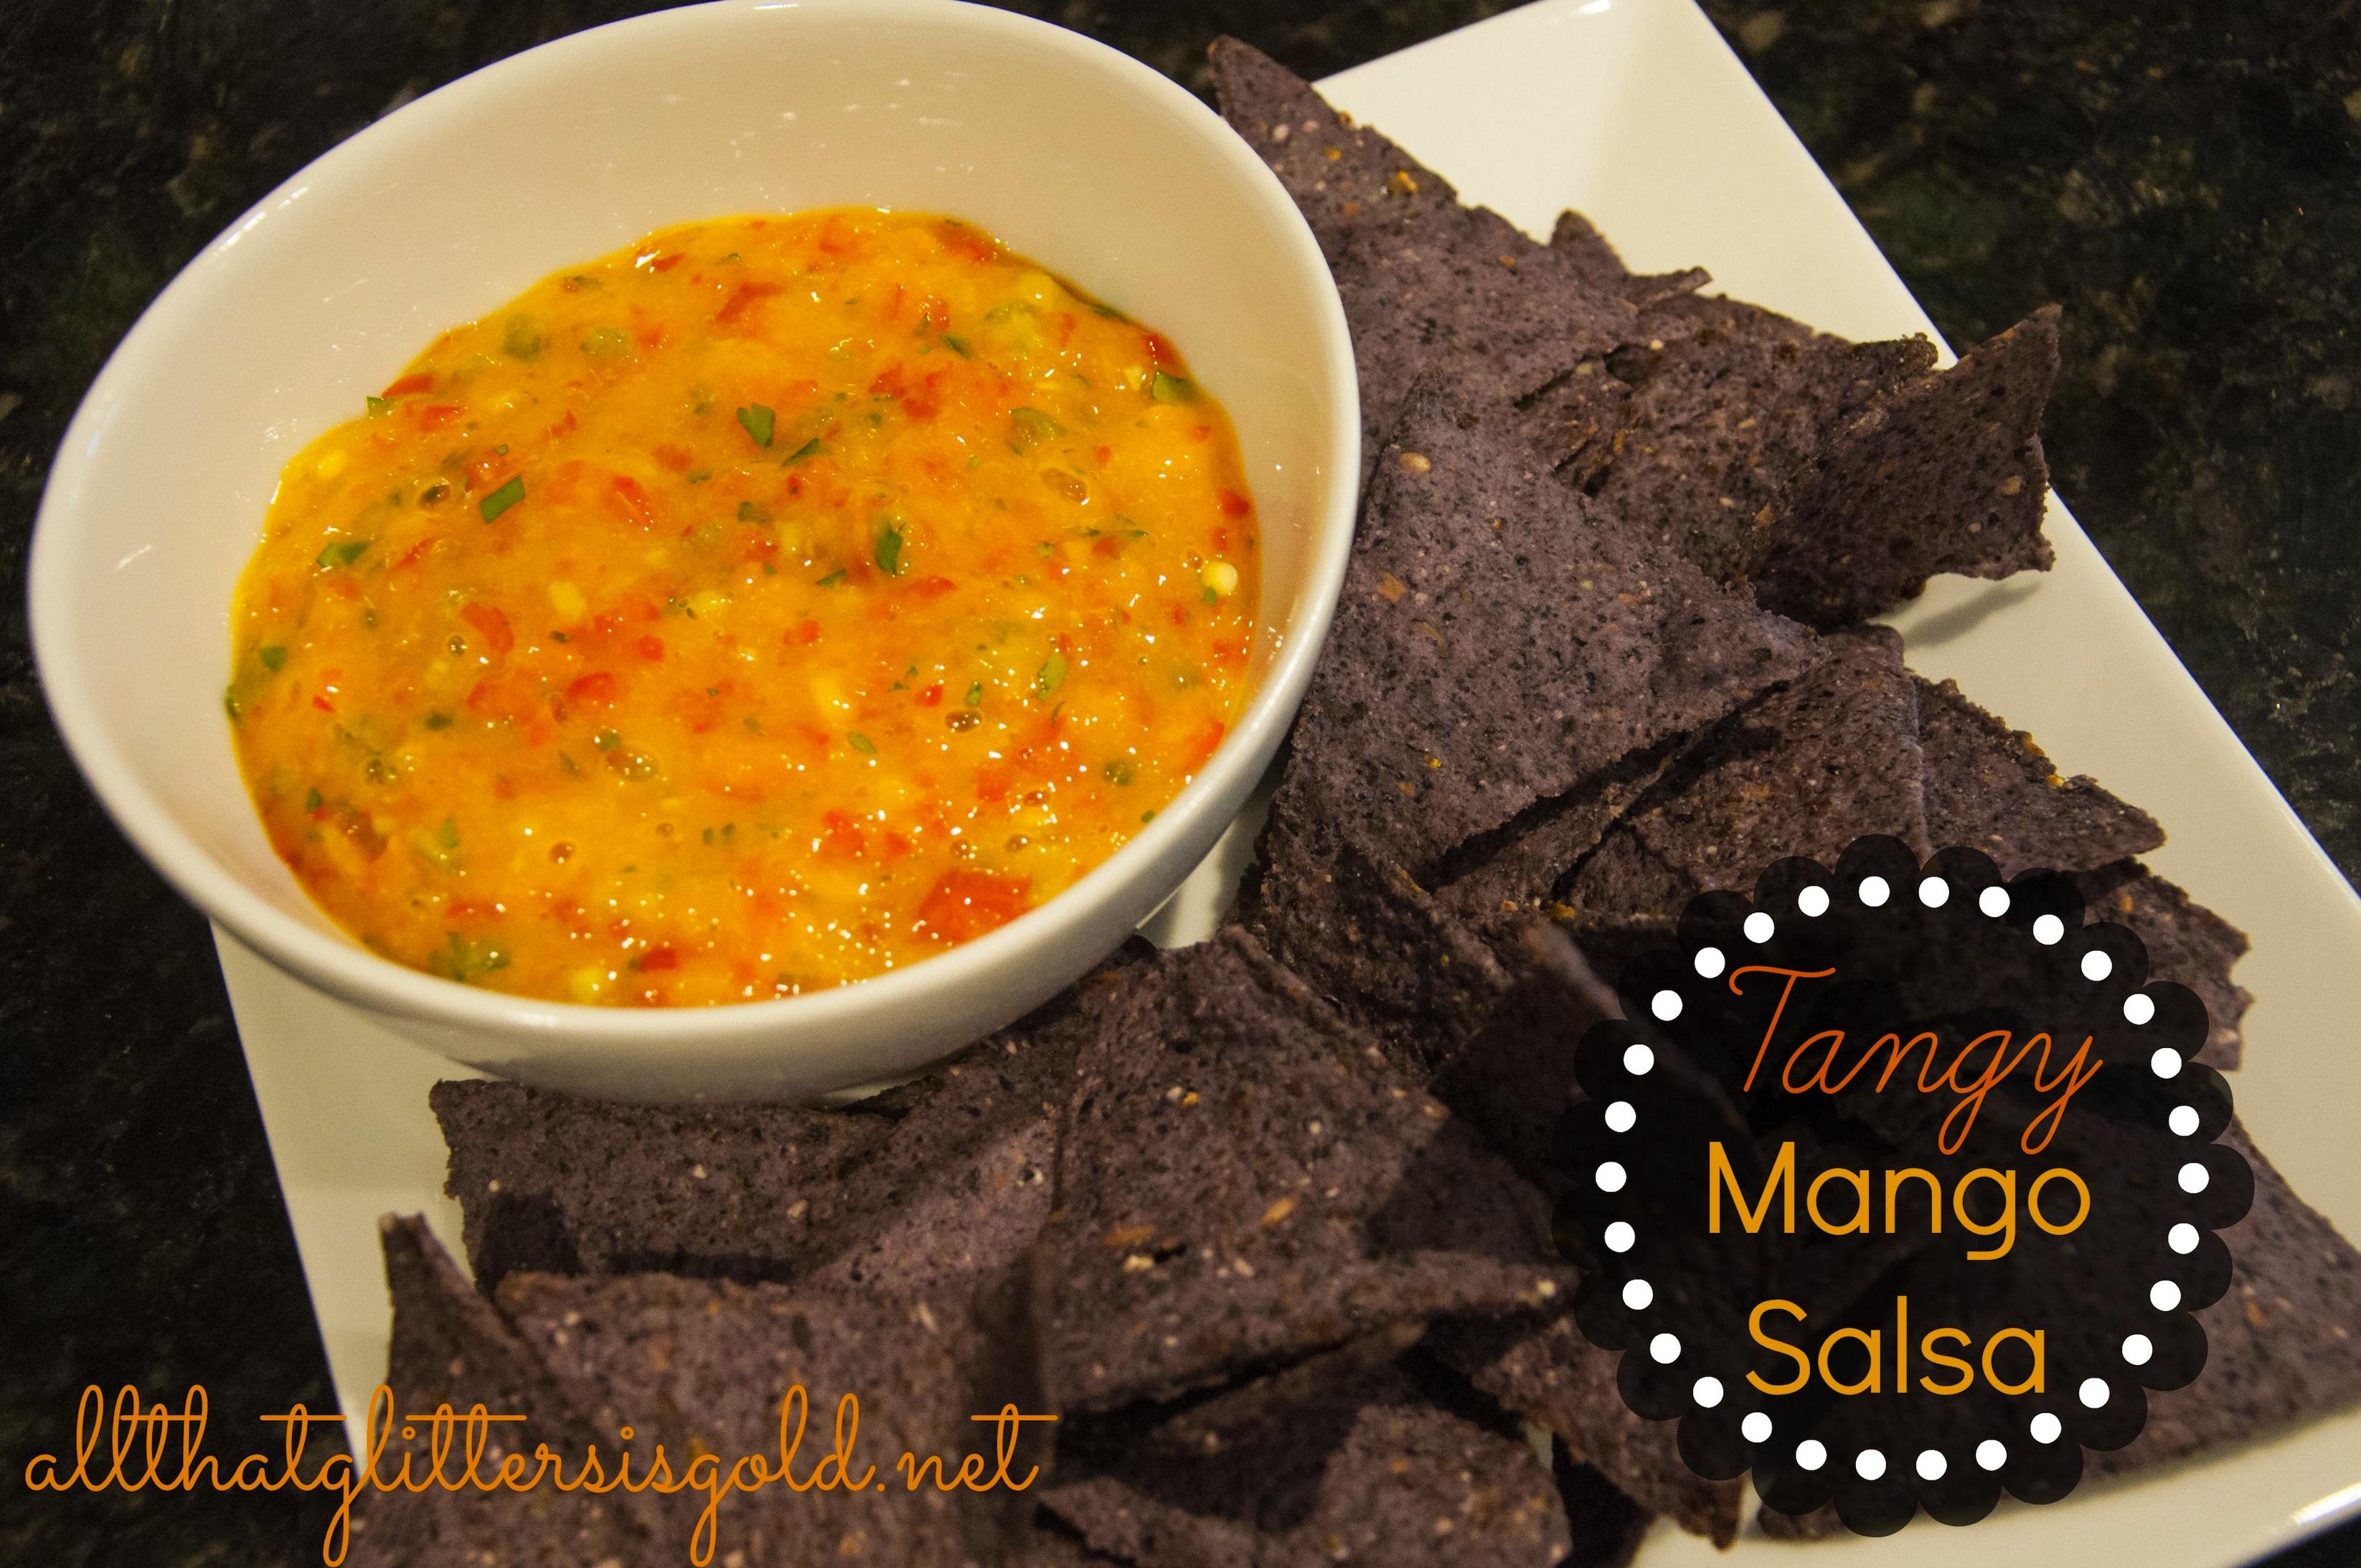 Tangy Mango Salsa